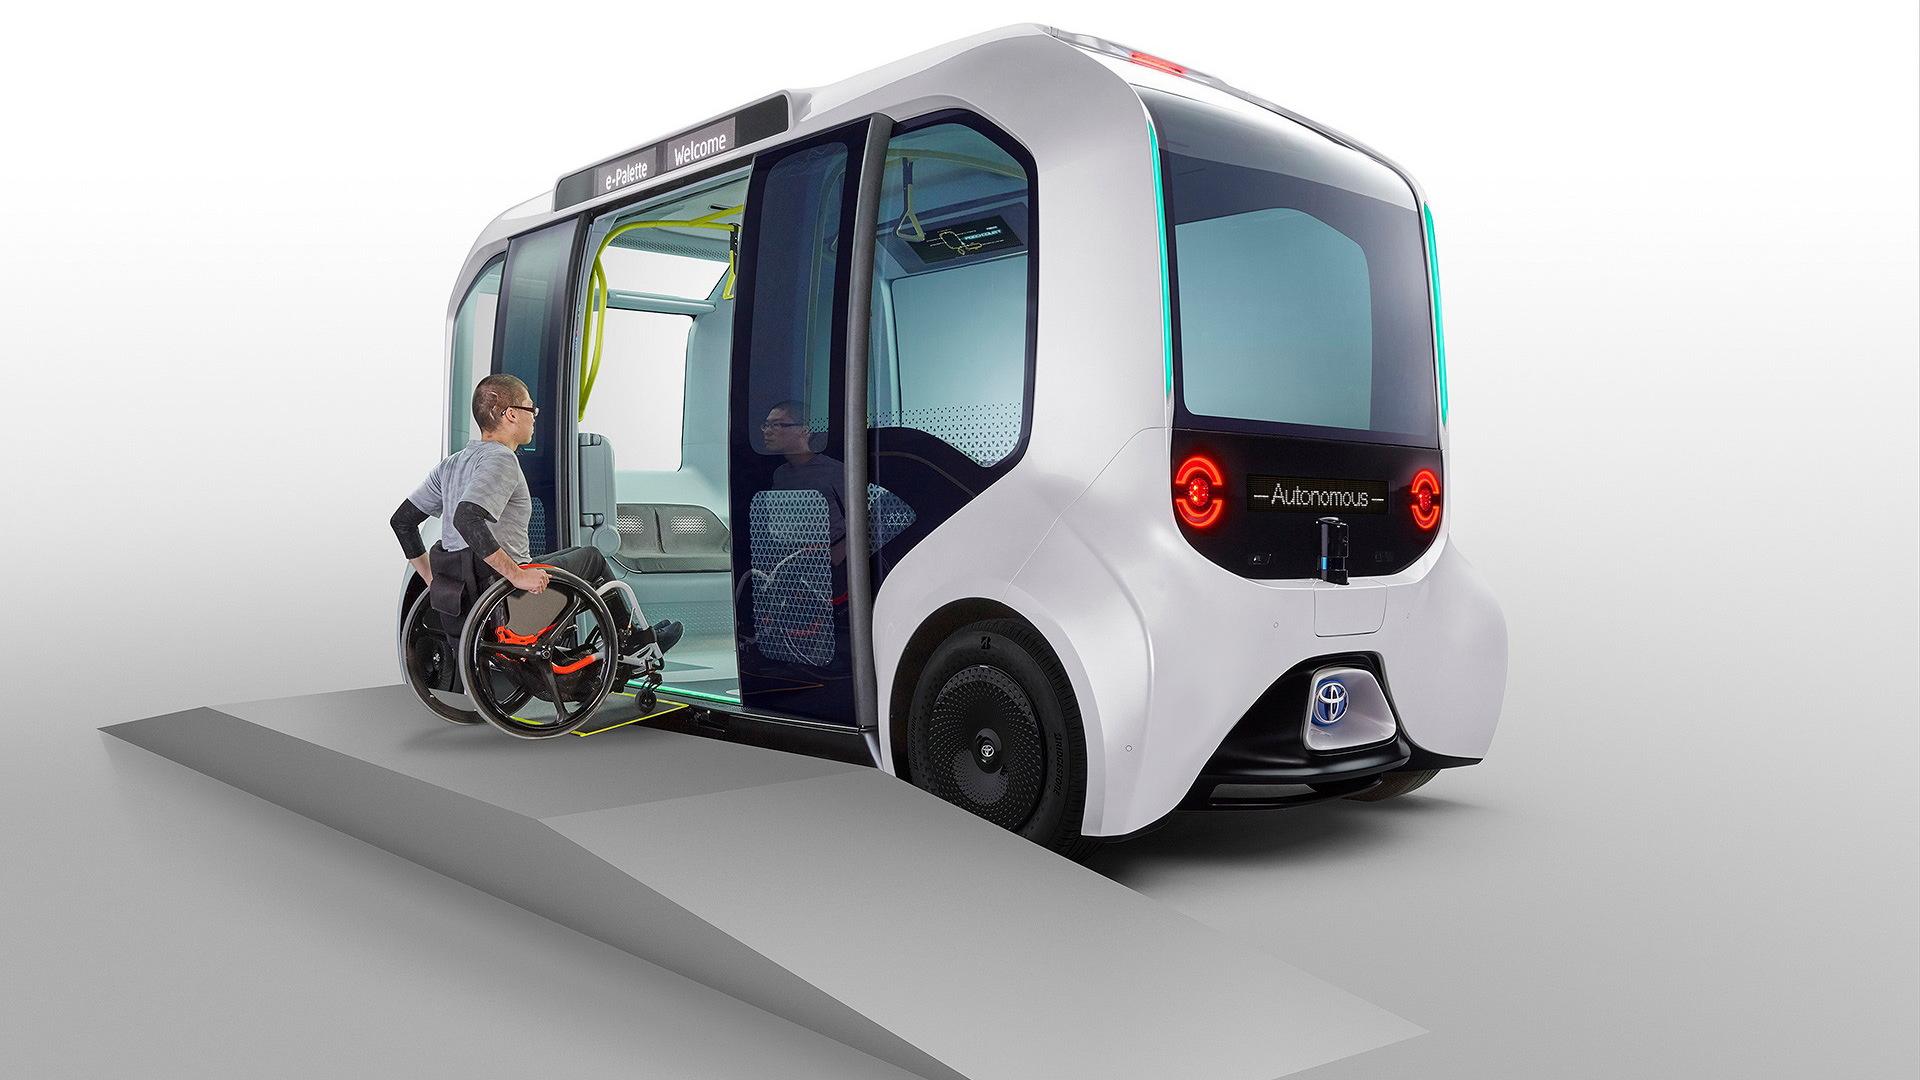 Toyota Tokyo 2020 Version e-Palette self-driving shuttle